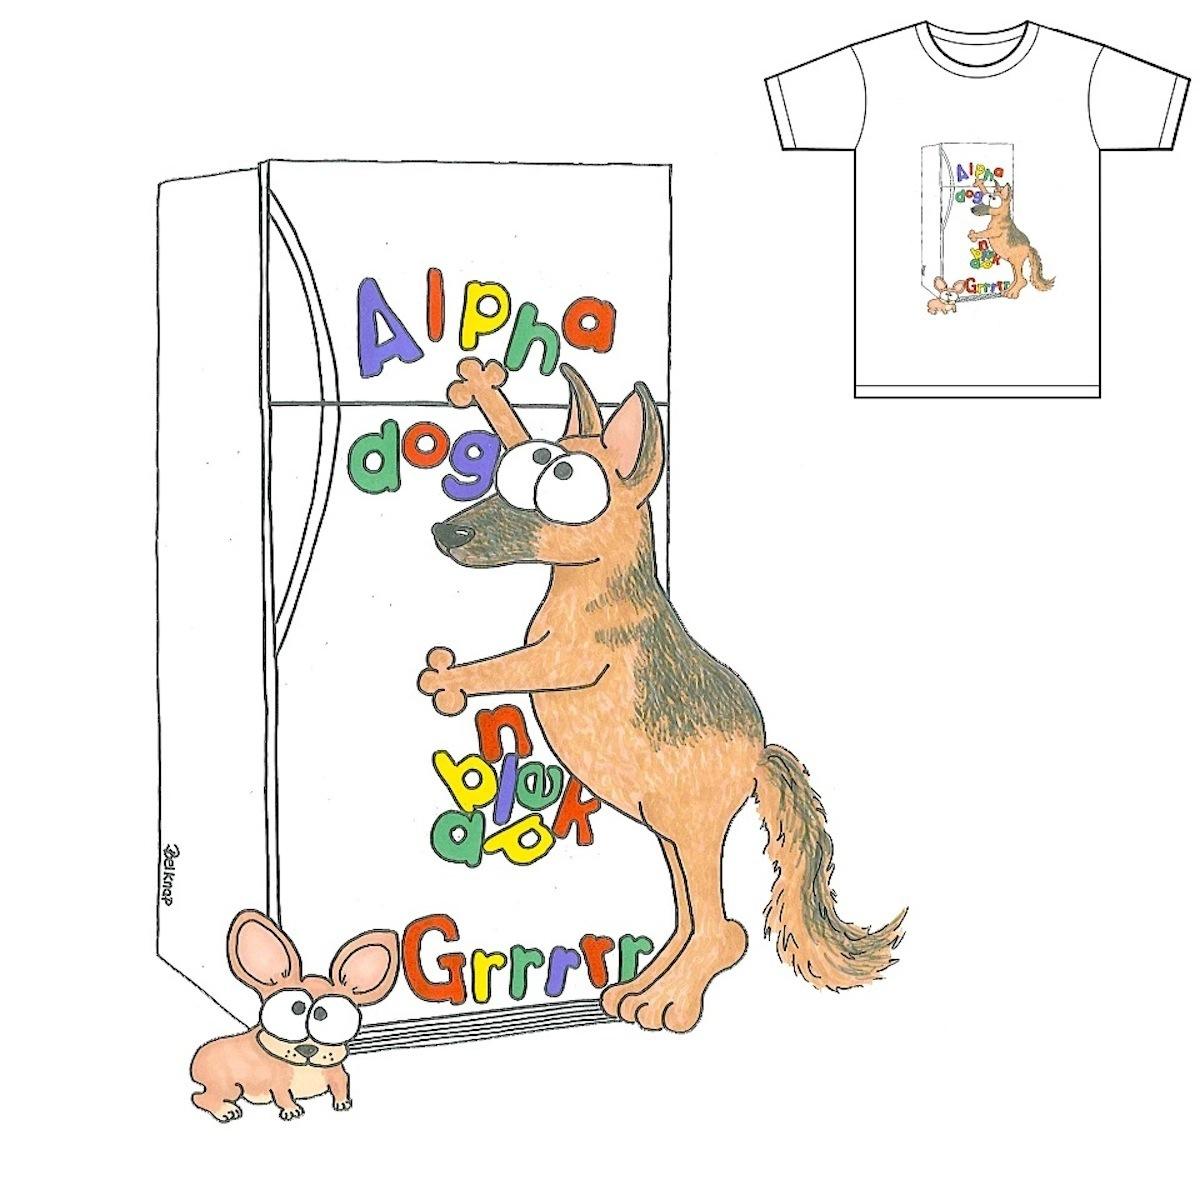 Alphabet Dog by Cbad-Designs on Threadless